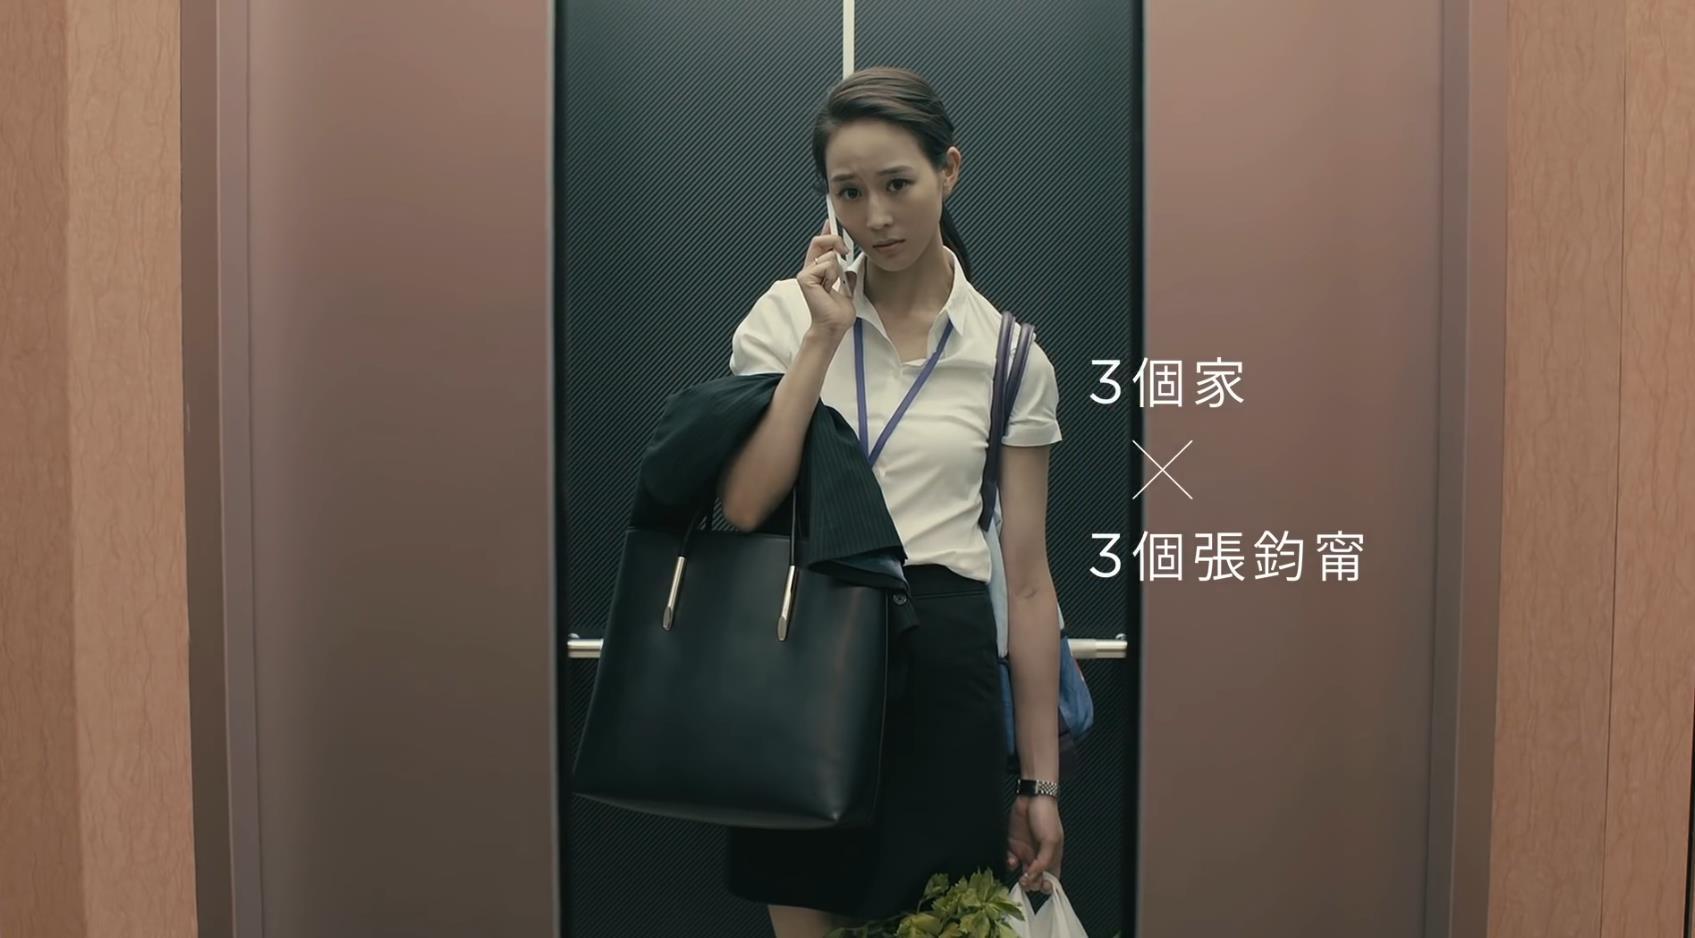 BenQ 家的投影机 恋家 微电影广告.mp4